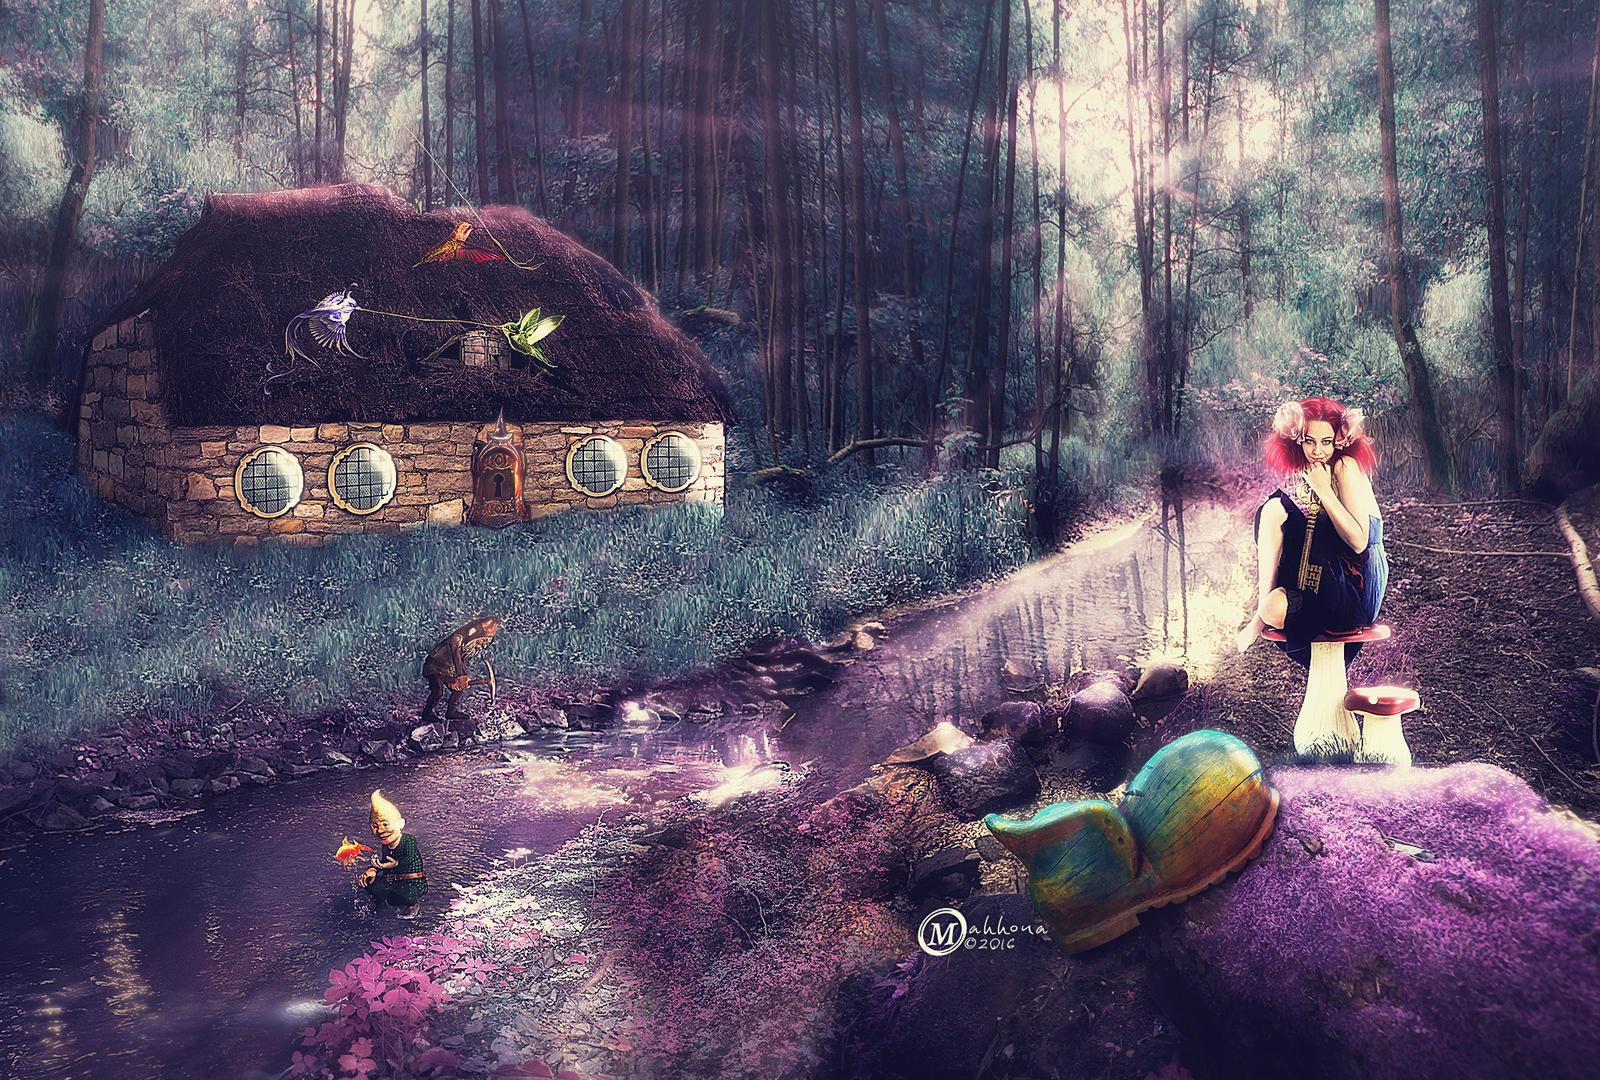 Working-on-fairy-house by Mahhona